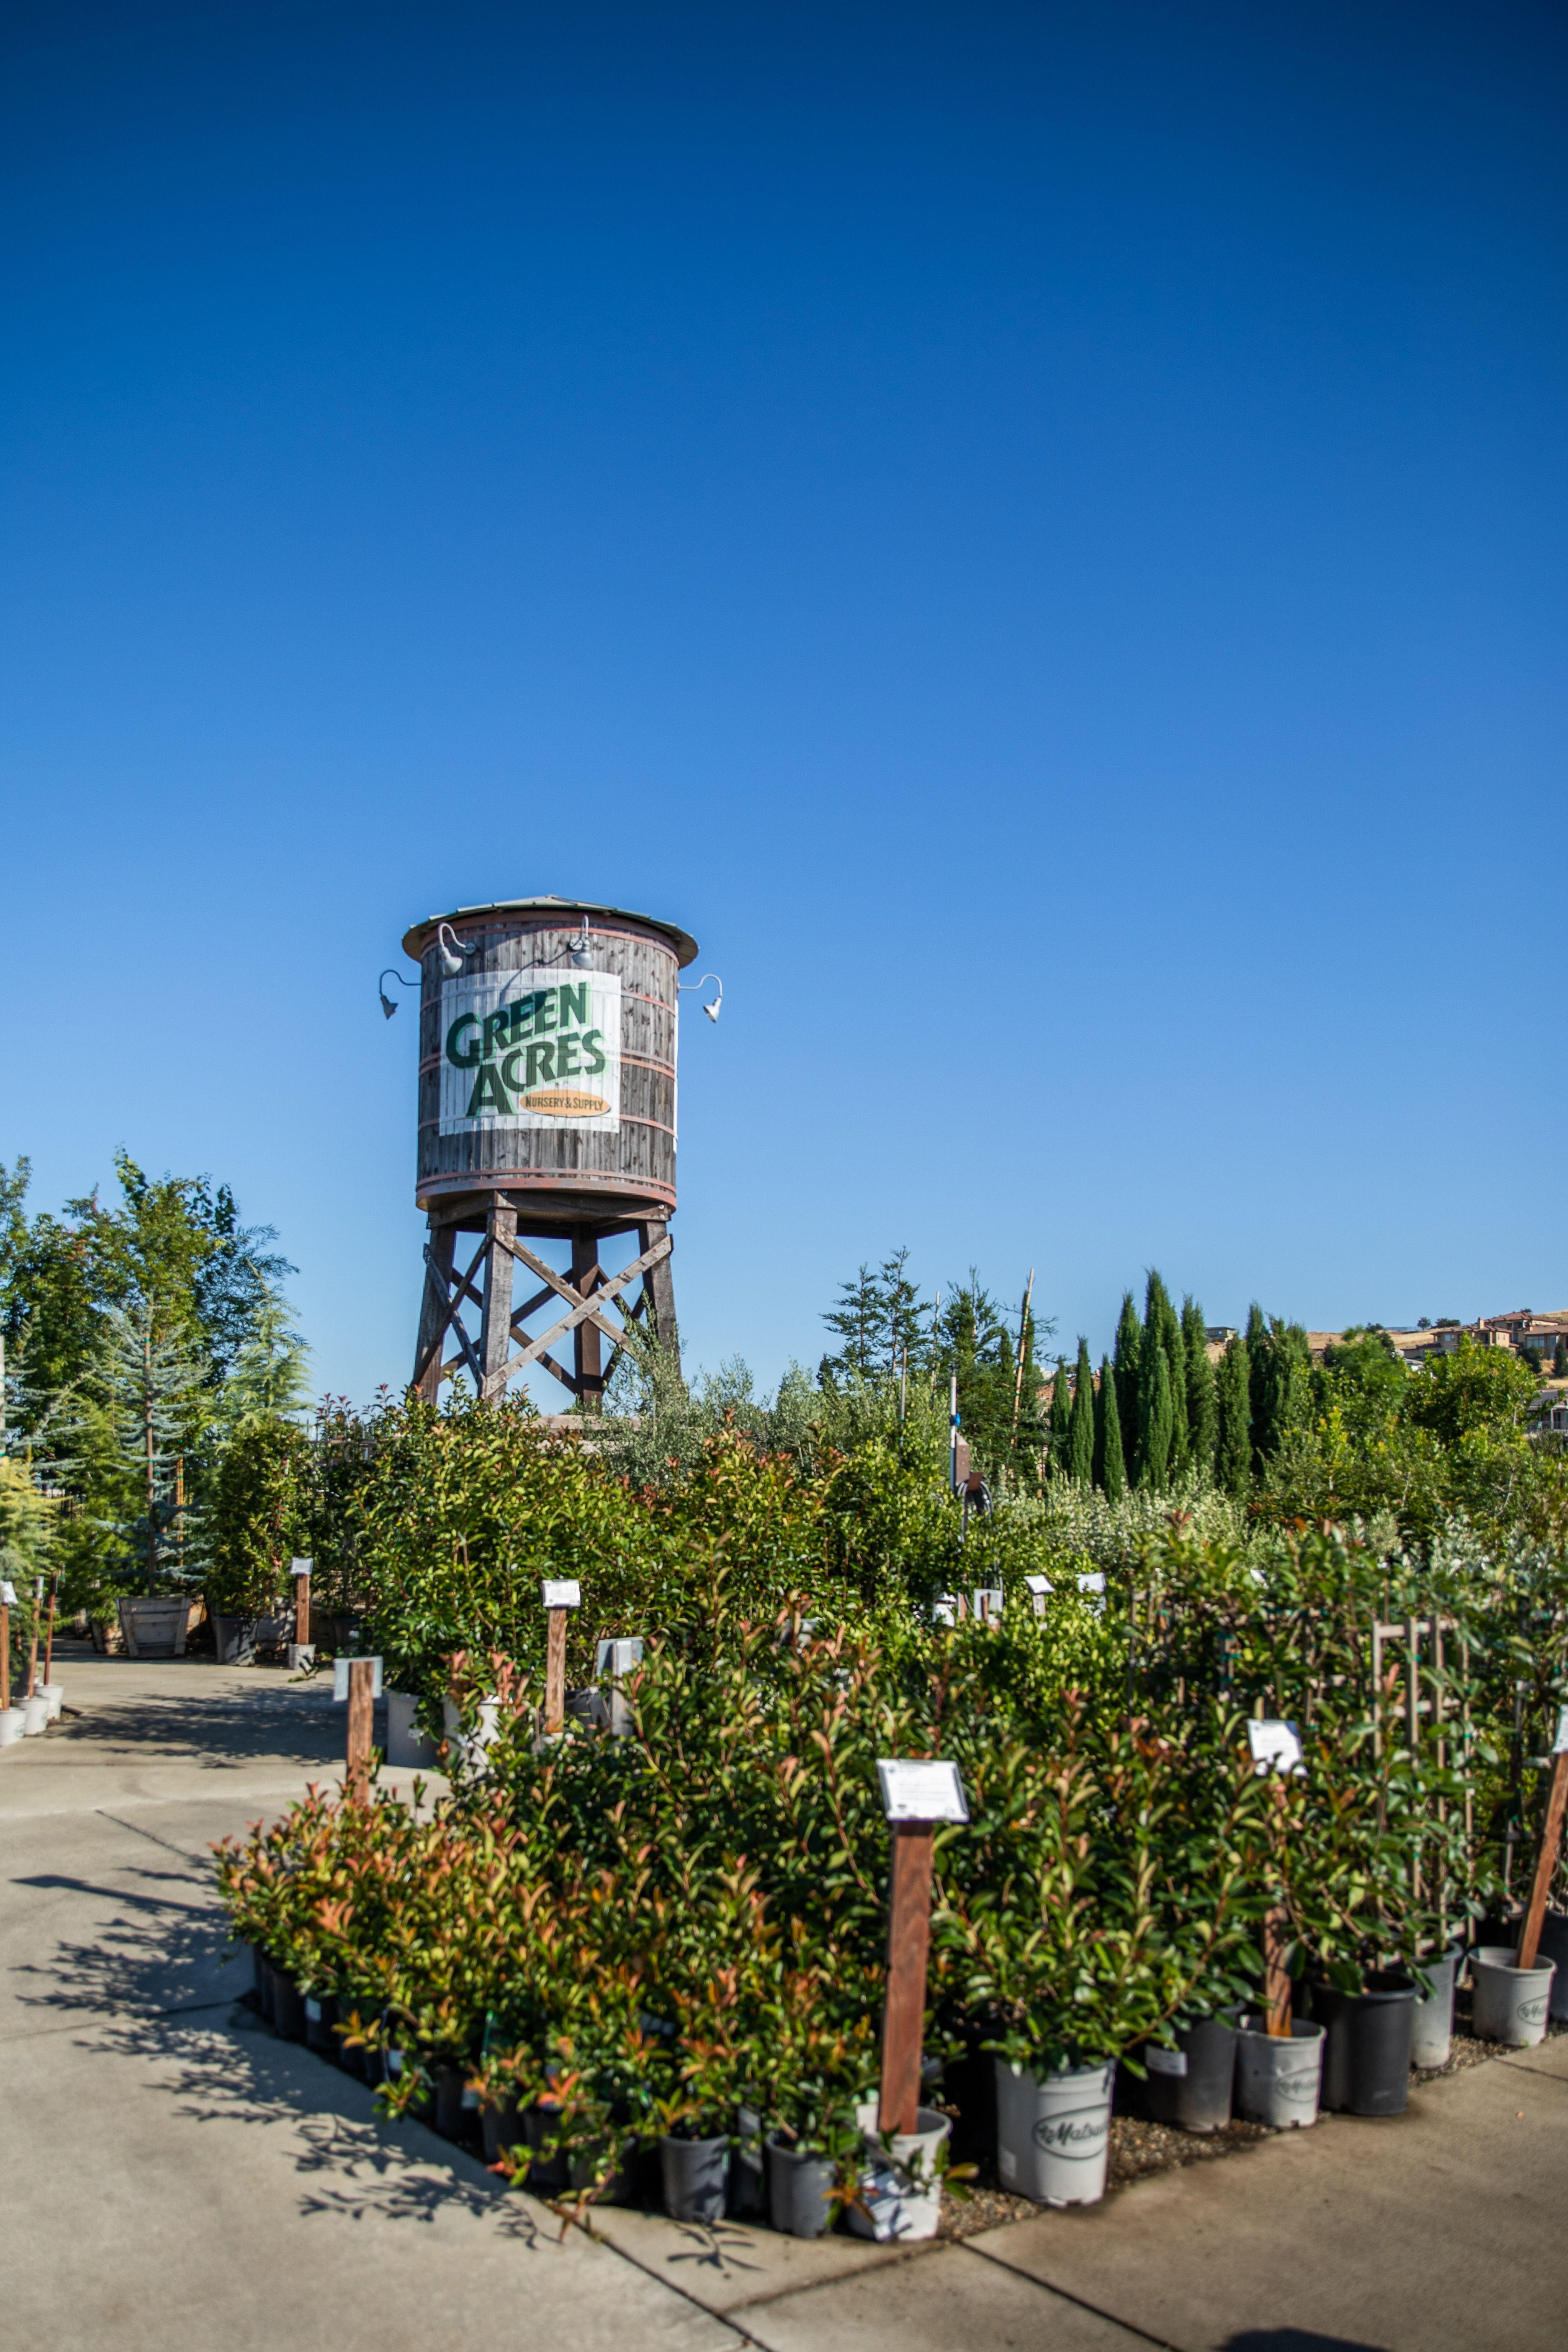 Garden center in Folsom with acres of trees, shrubs